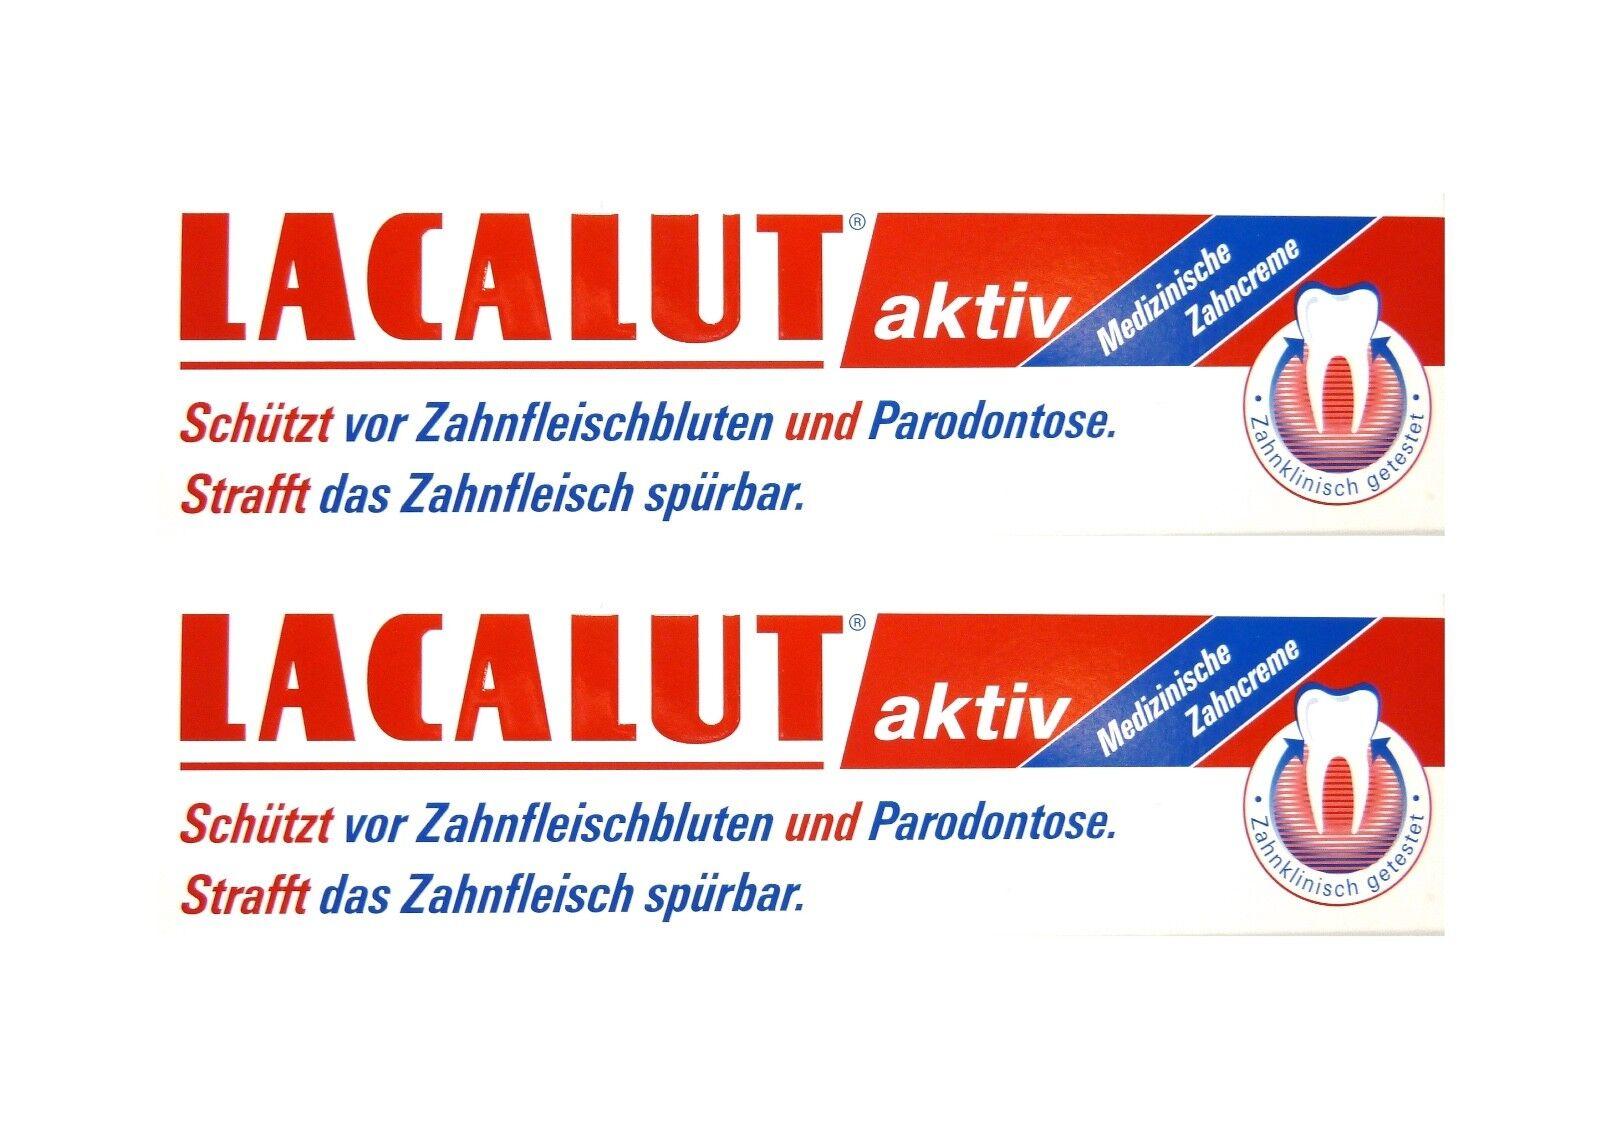 2x LACALUT aktiv Zahncreme 100 ml PZN 5484132 Parodontose Zahnfleischbluten